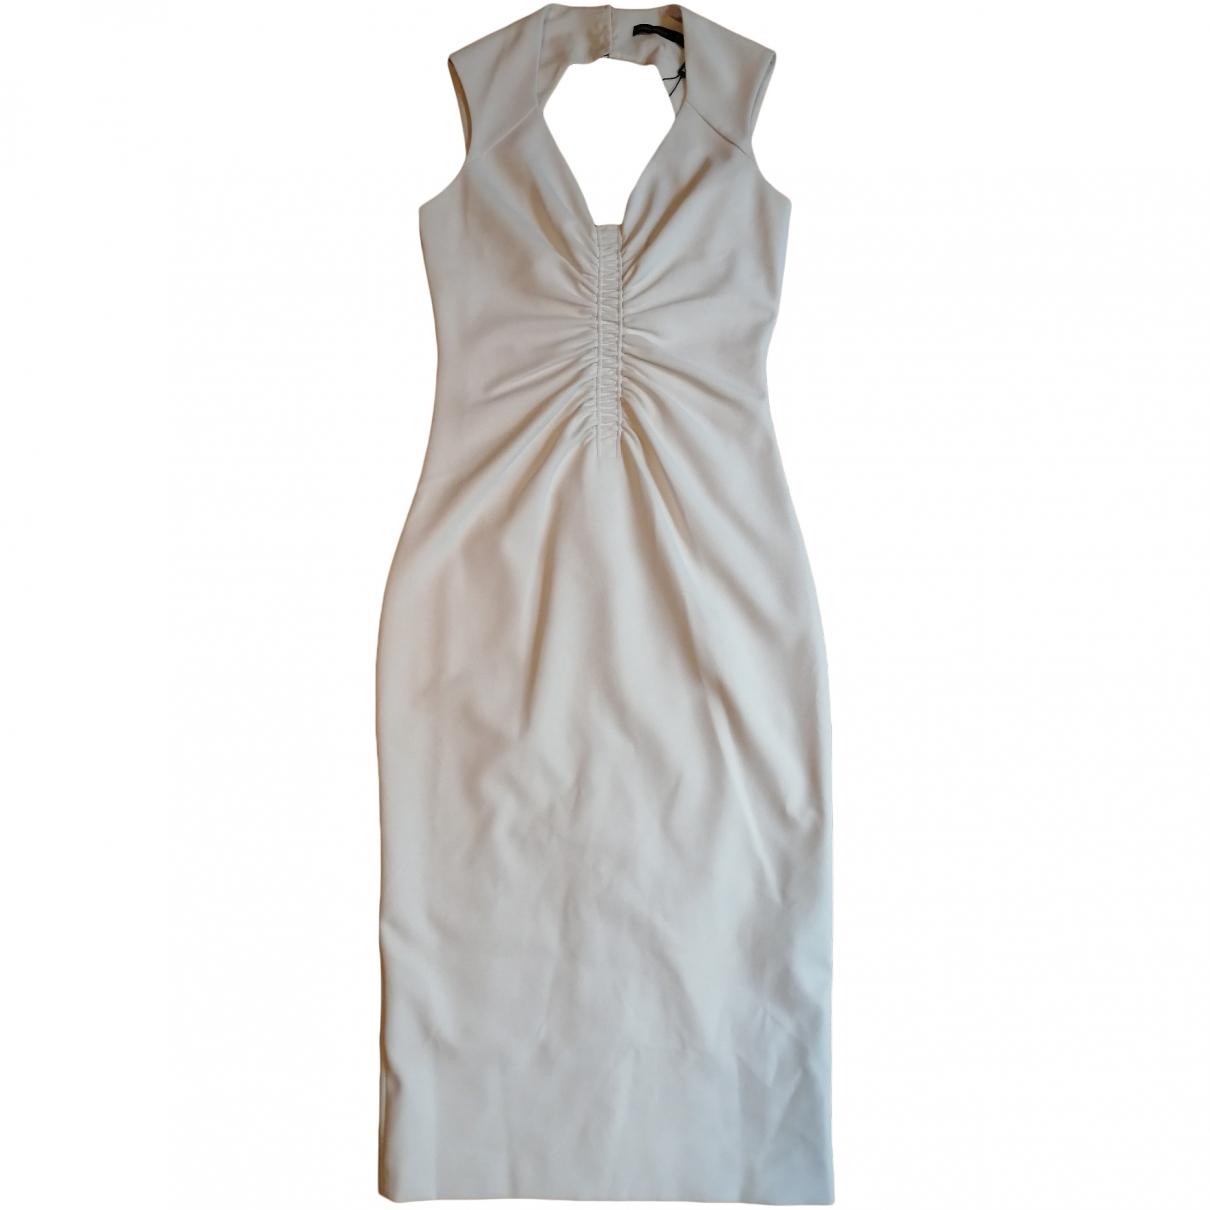 Karen Millen \N Beige dress for Women 38 FR